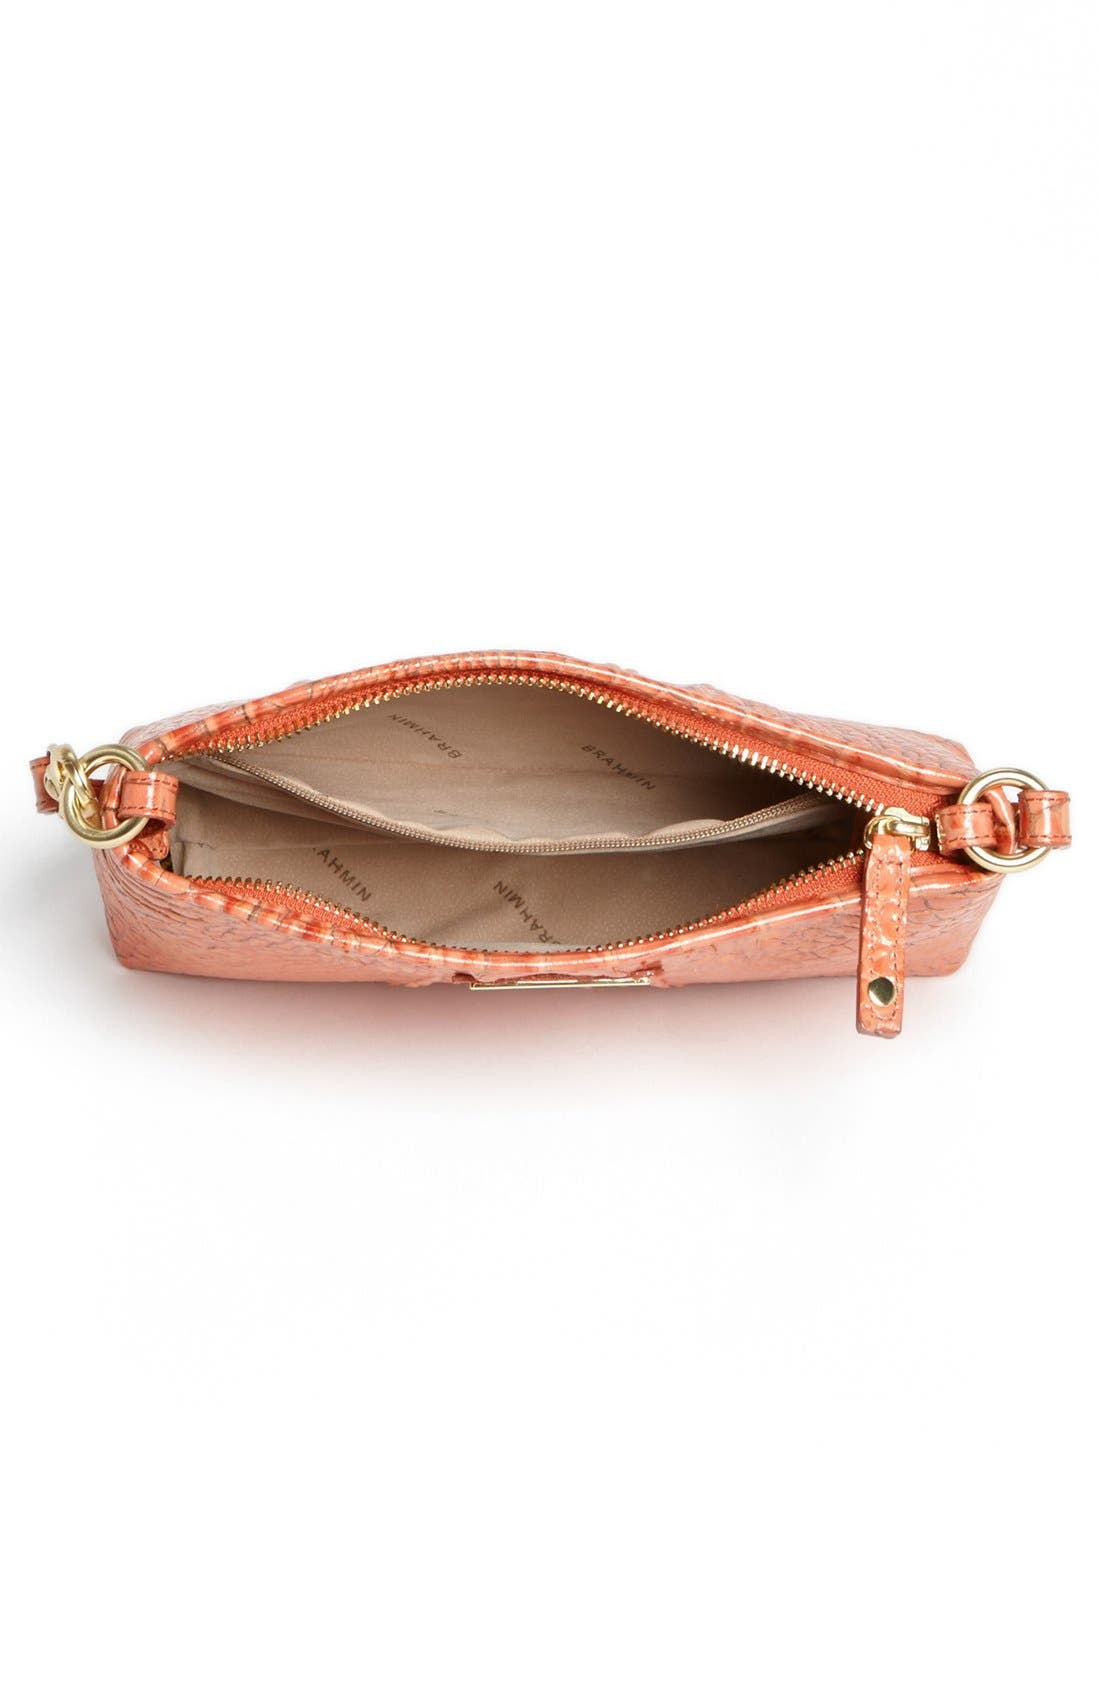 'Anytime - Mini' Convertible Handbag,                             Alternate thumbnail 70, color,